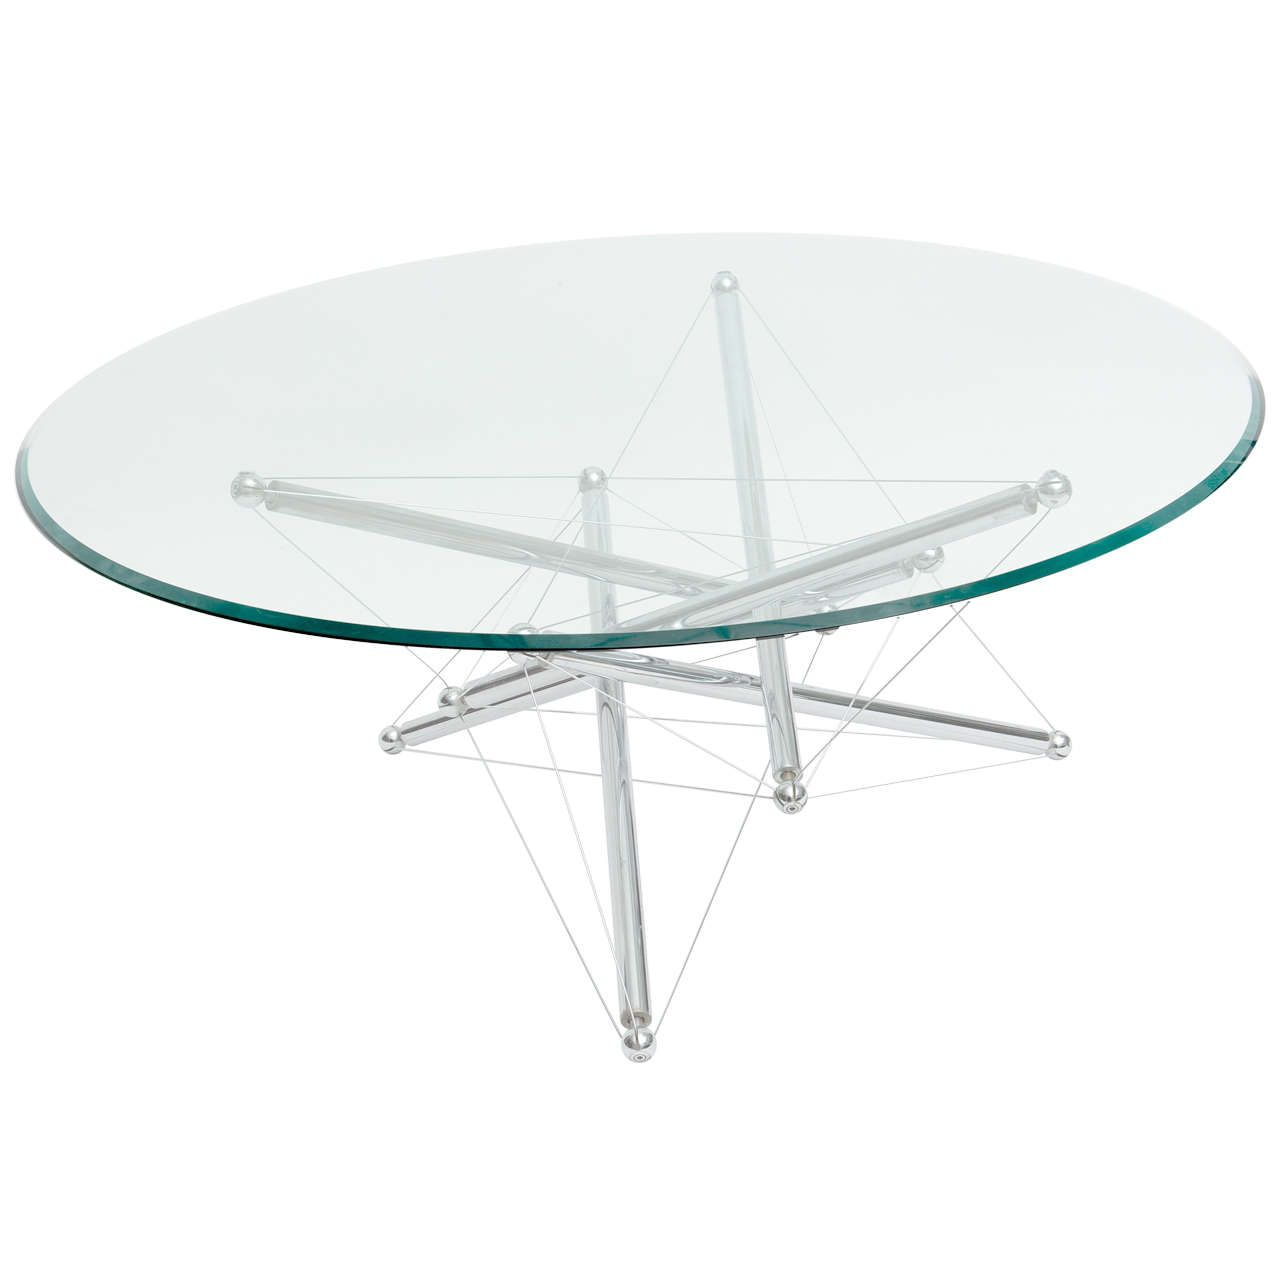 Italian Modern Polished Chrome Low Table Theodore Waddell For Cassina Low Tables Polished Chrome Modern Glass [ 1280 x 1280 Pixel ]